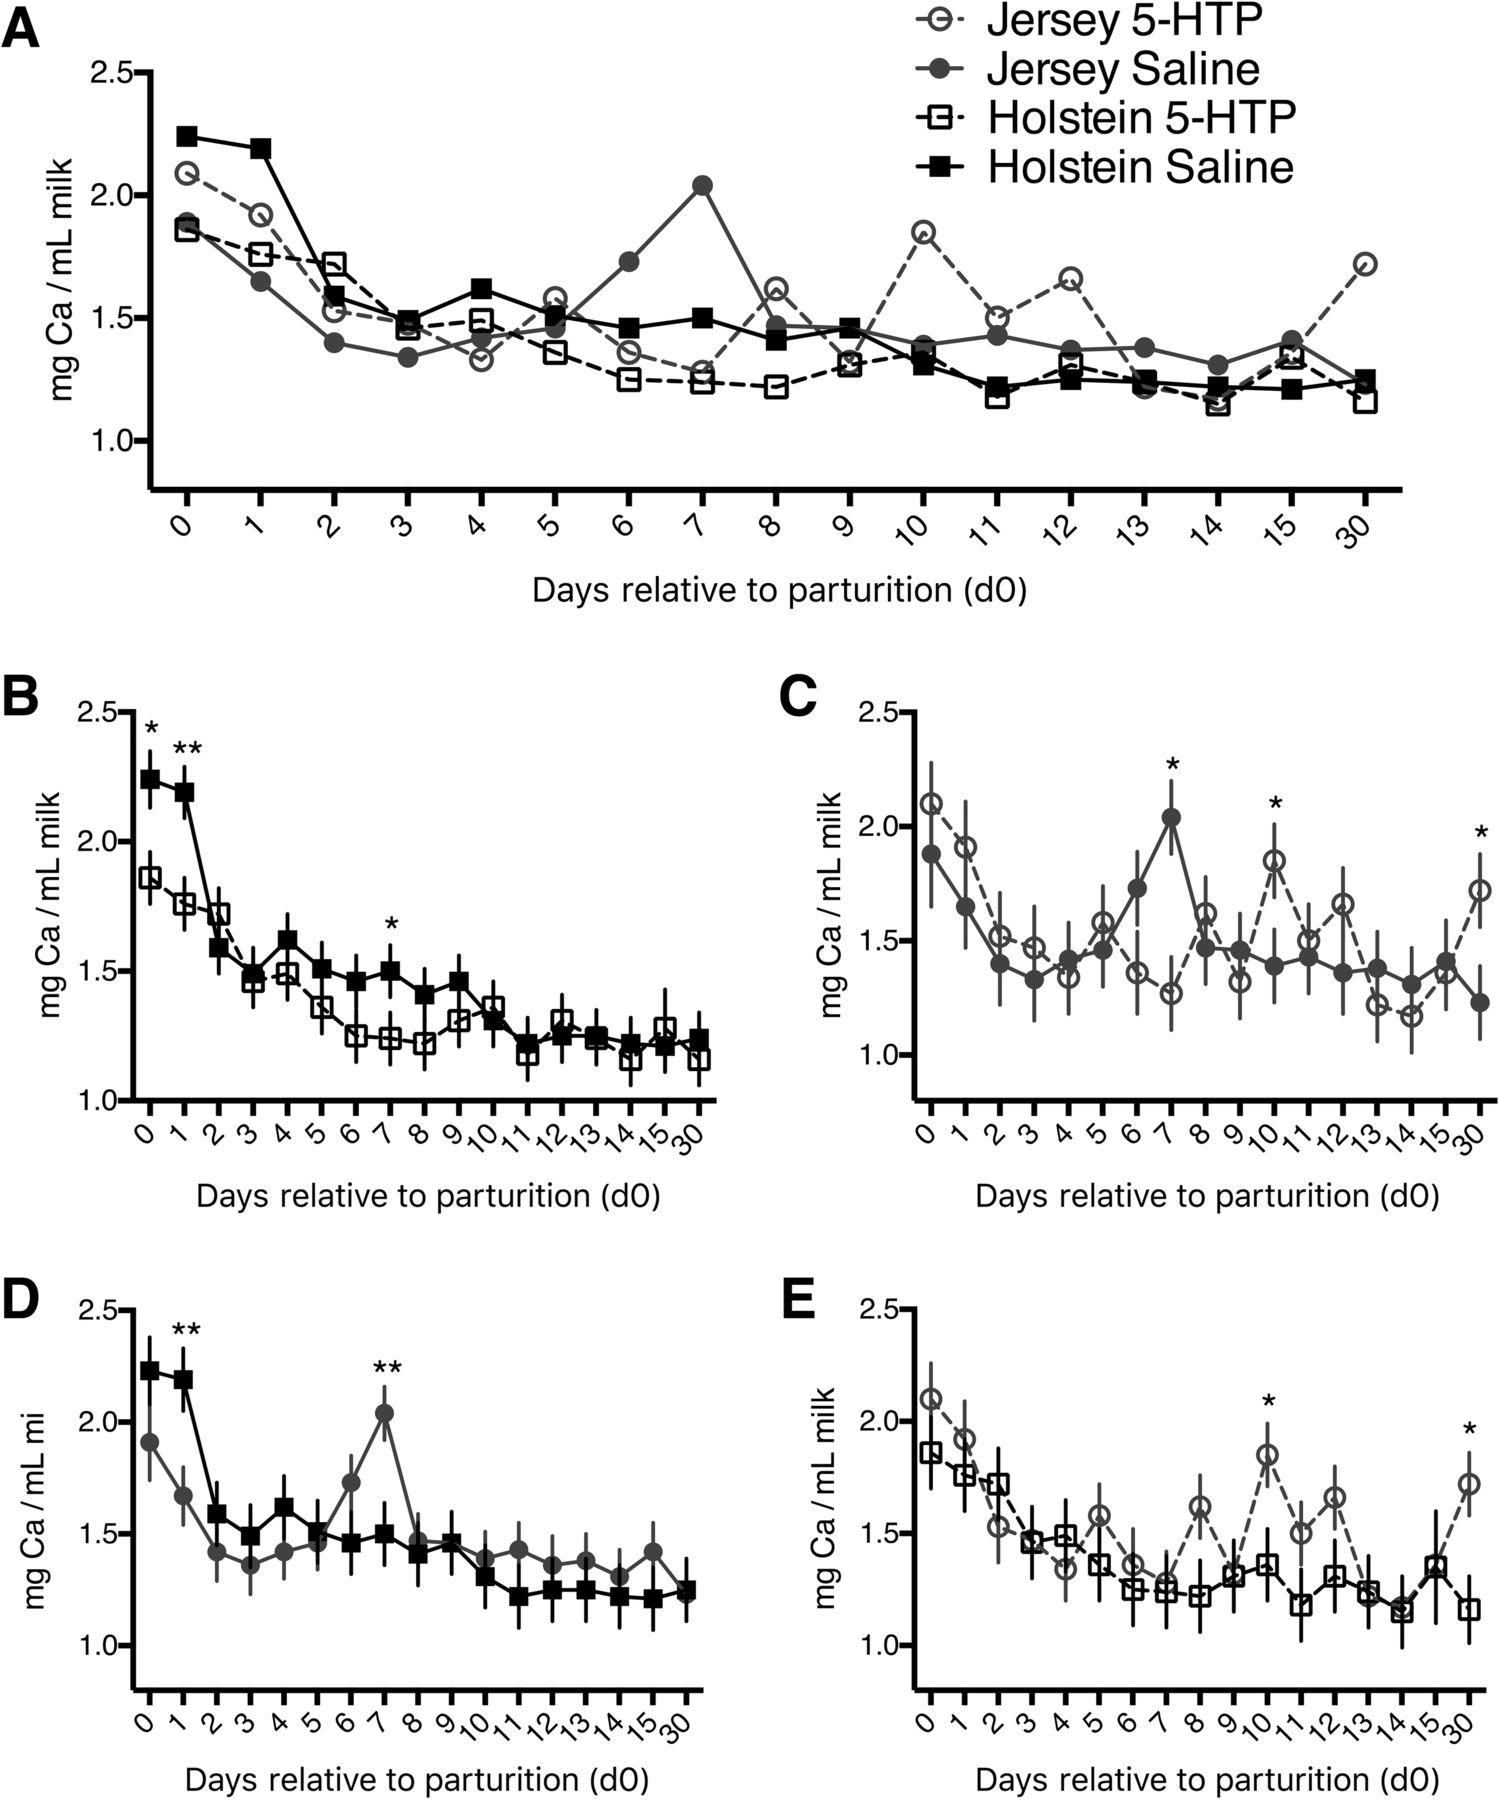 Elevation of circulating serotonin improves calcium dynamics in the